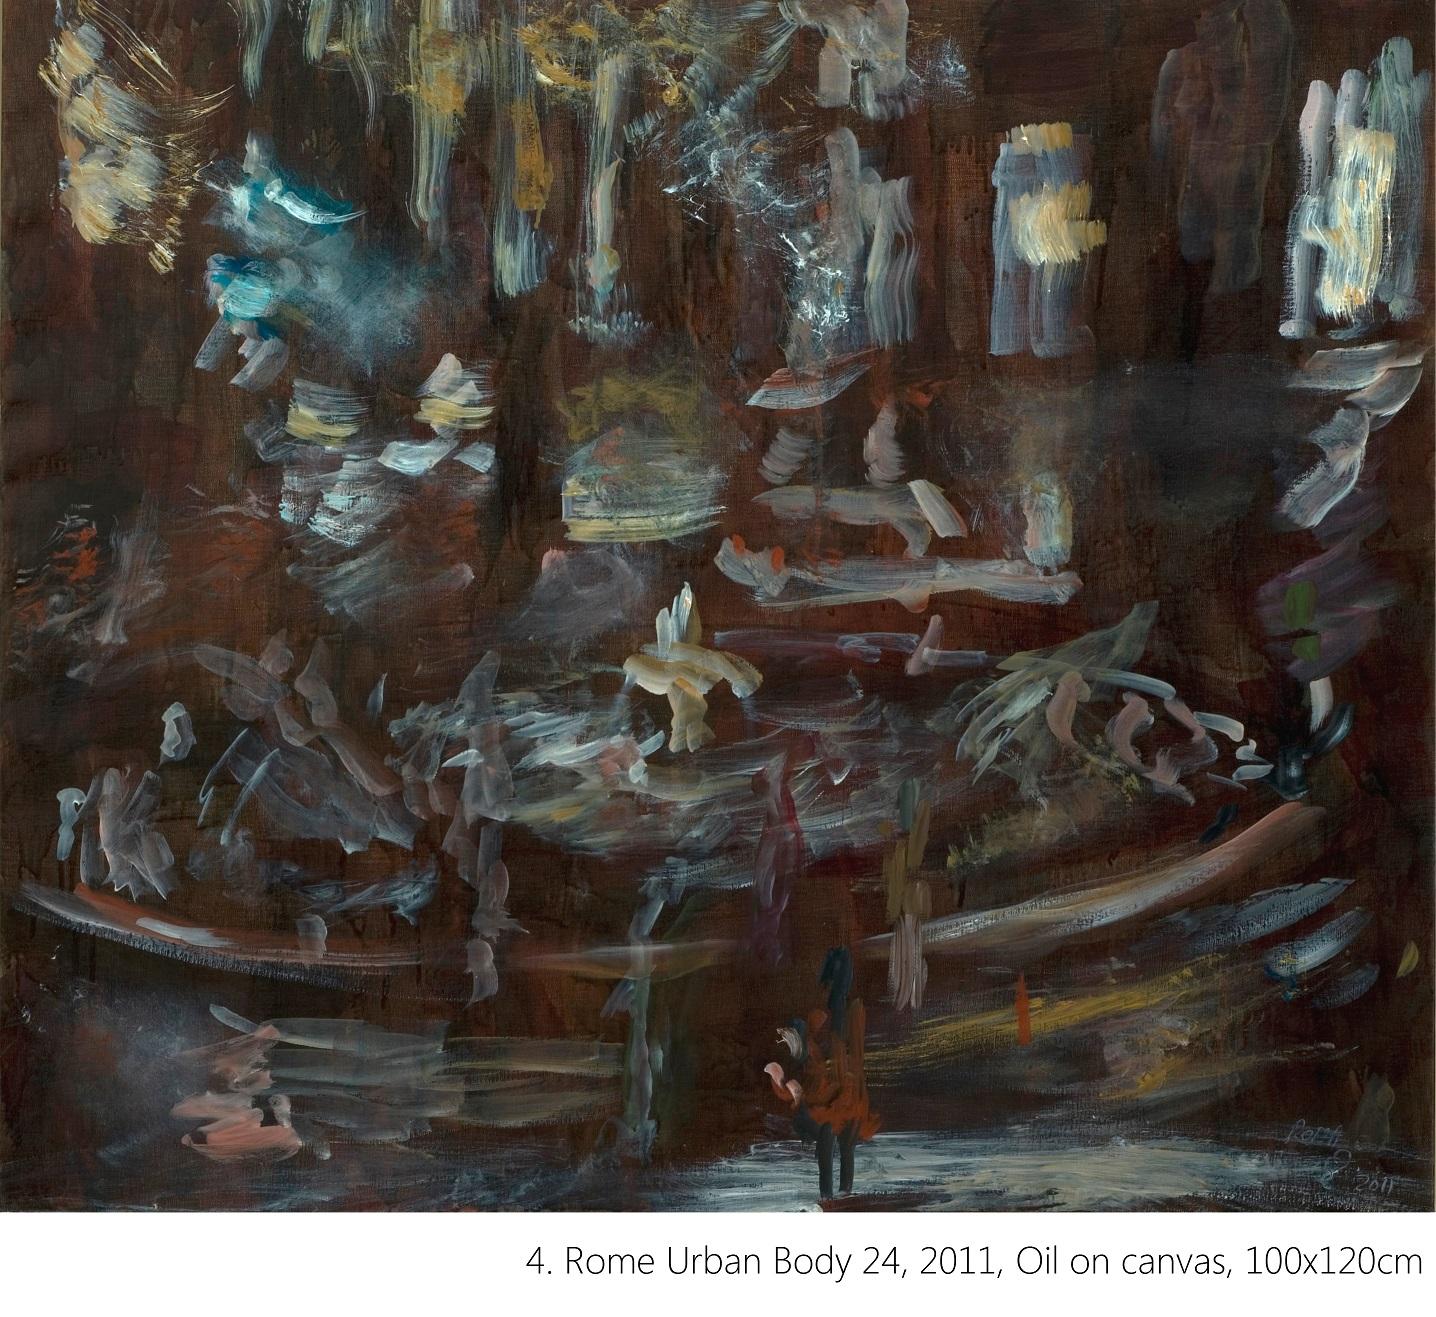 4. Rome Urban Body 24, 2011, Oil on canvas, 100x120cm